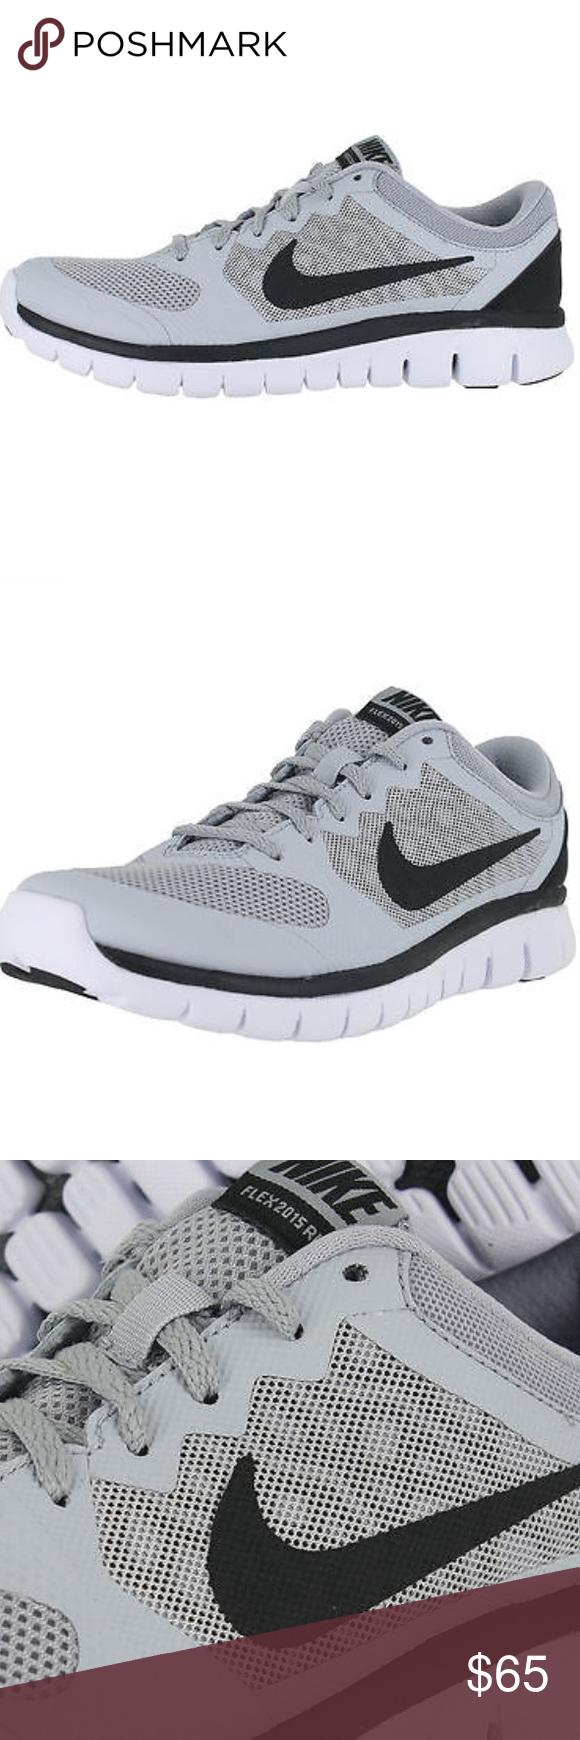 Nike Flex Nwt Gris Mujeres Zapatillas New Nwt Flex Nike Flex Corriendo 463274